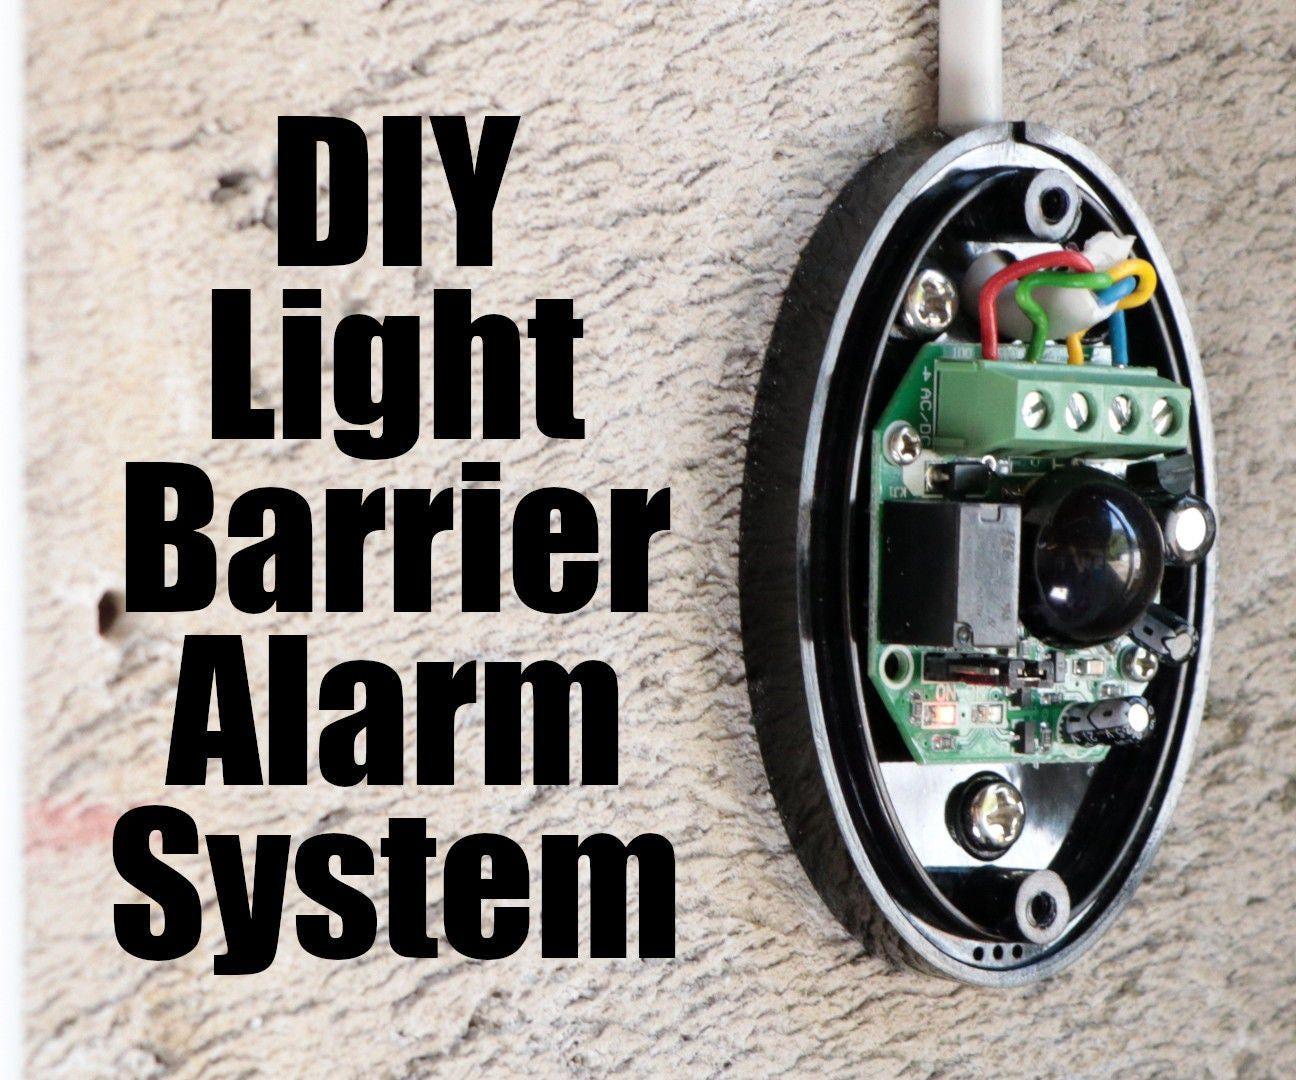 Diy Light Barrier Alarm System With An Industrial Grade Plc